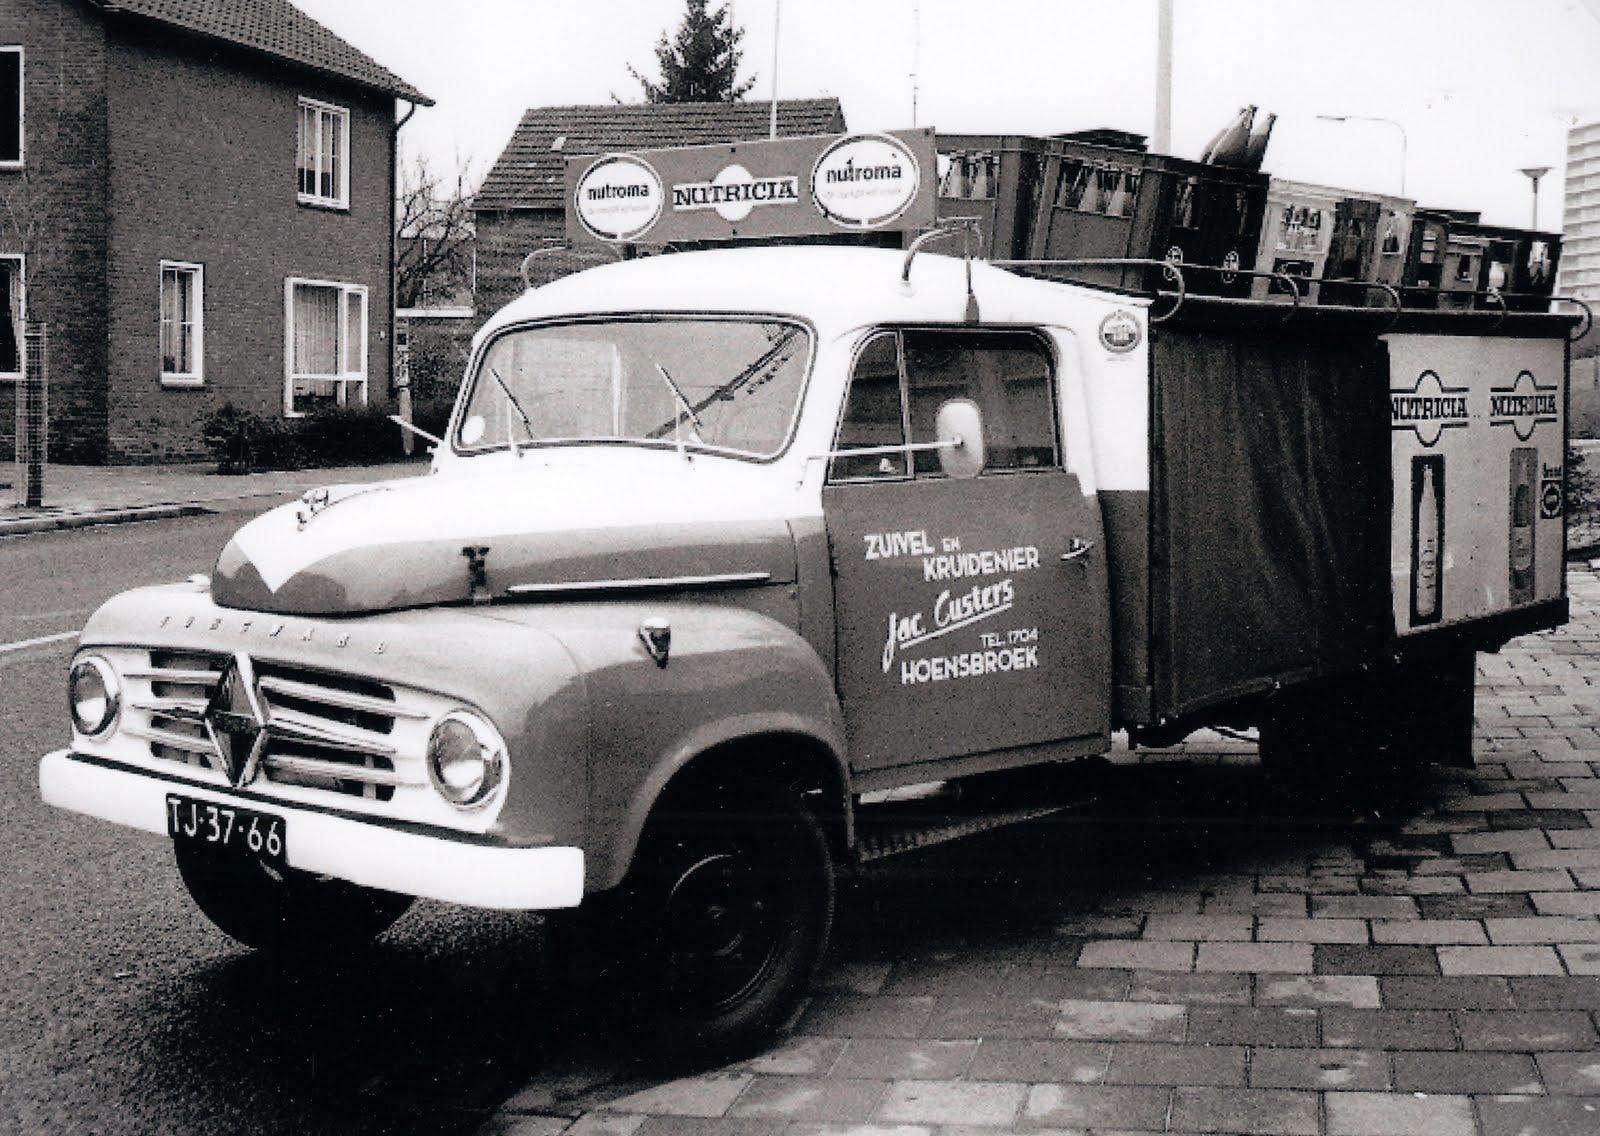 Borgward-B-1500-1955-zuivelhanden-en-kruidenier